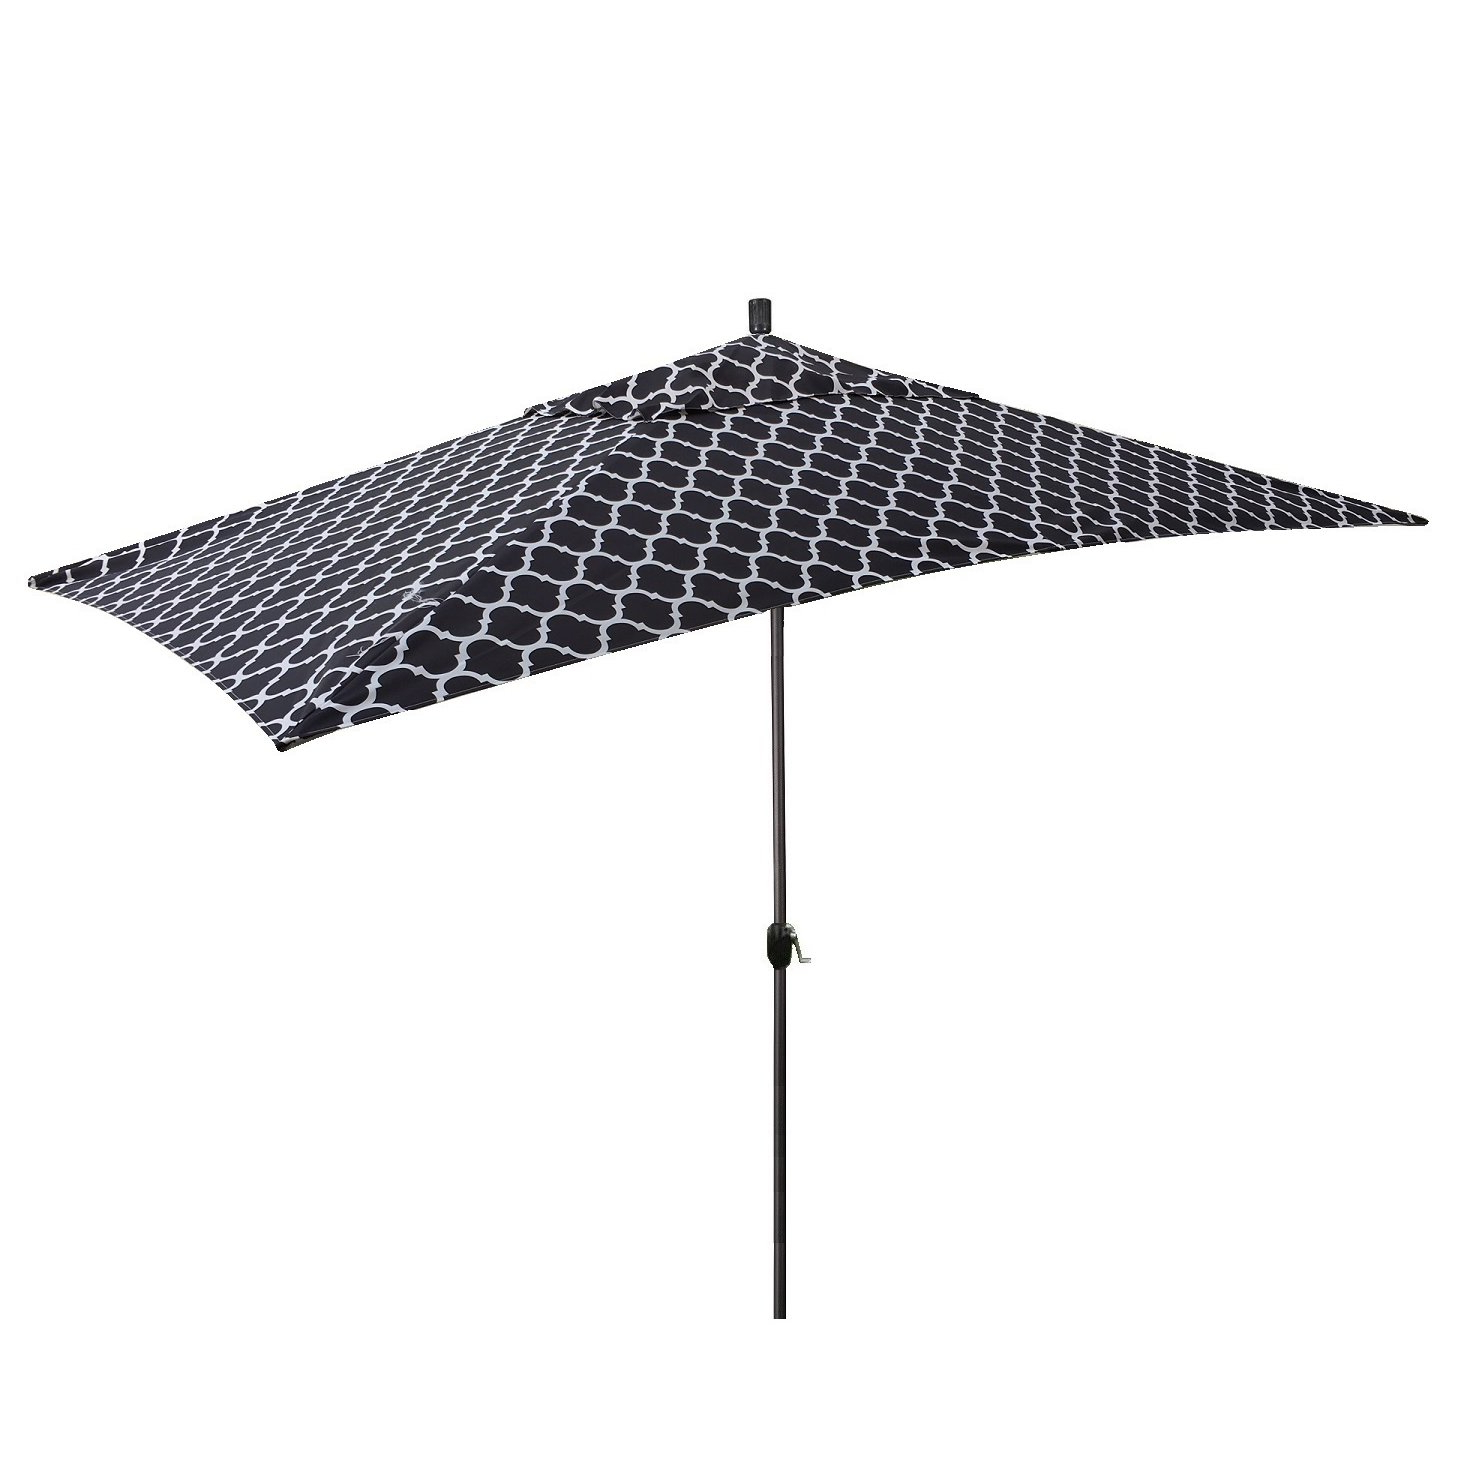 Newest Sherlyn 10' X 6' Rectangular Market Umbrella Intended For Norah Rectangular Market Umbrellas (View 12 of 20)